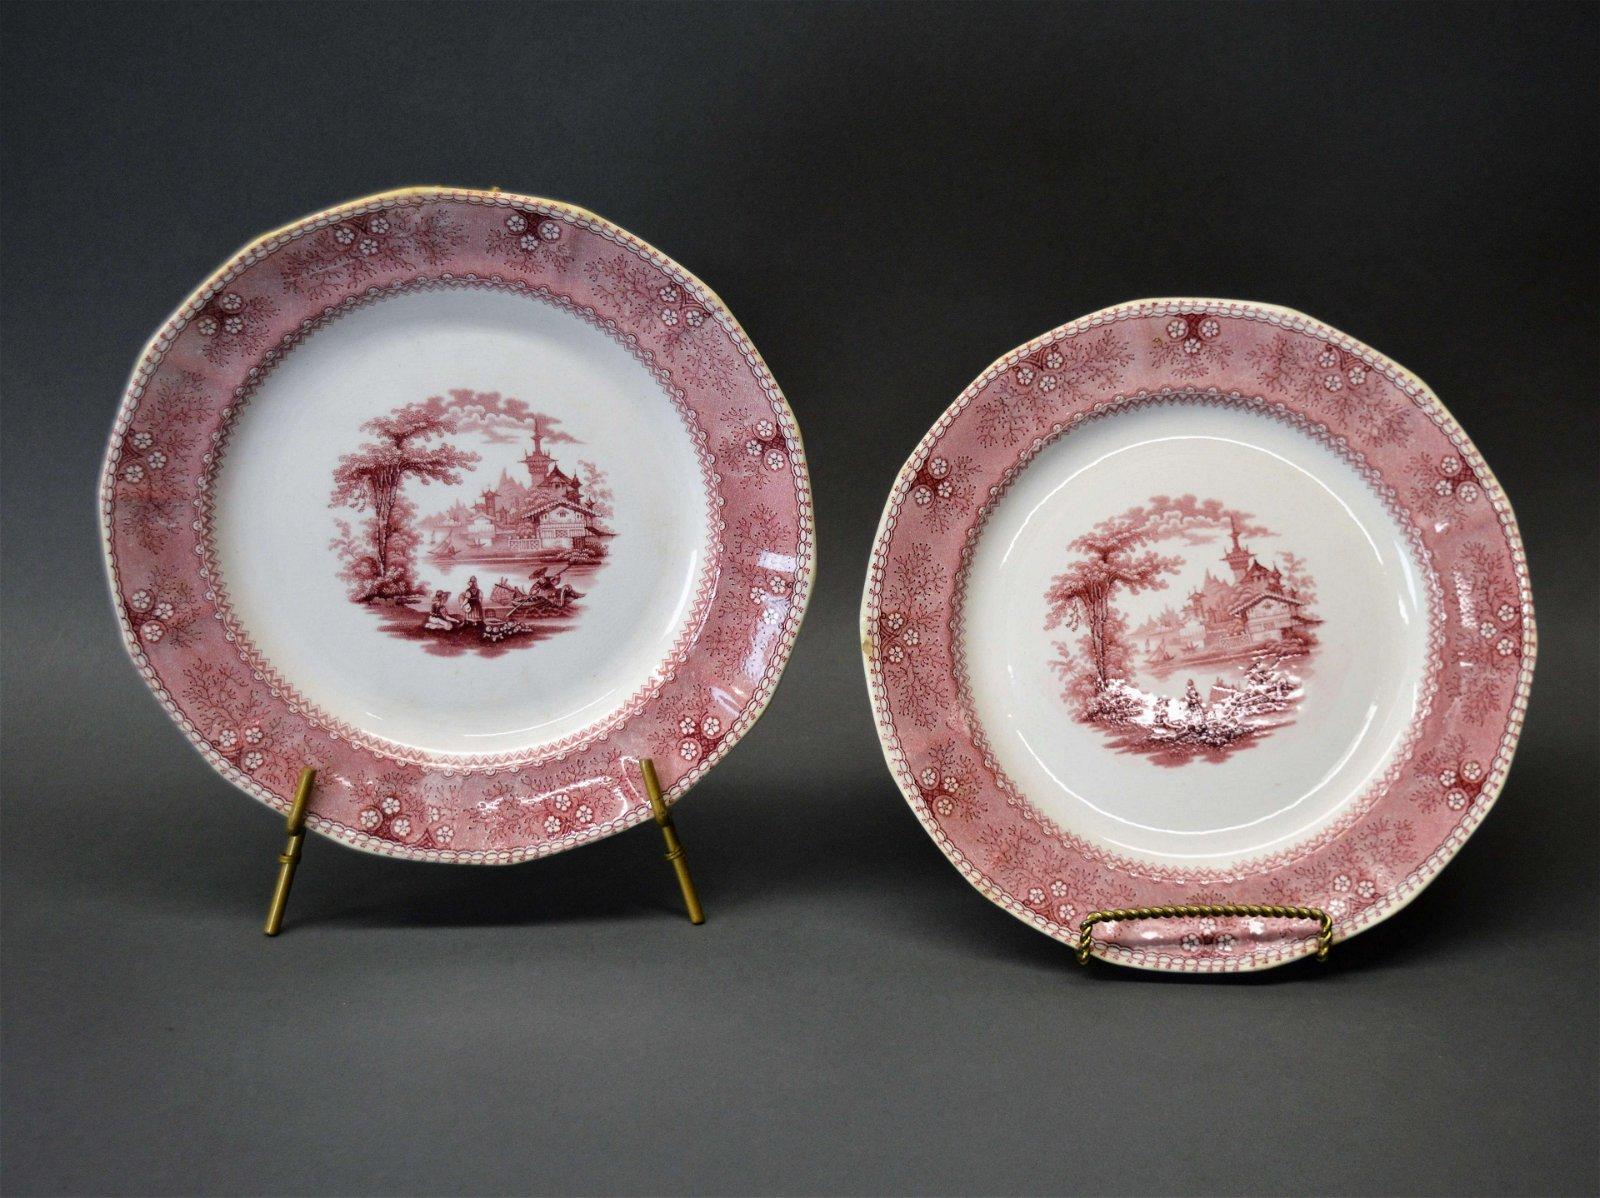 Two Romantic Staffordshire Transferware Plates